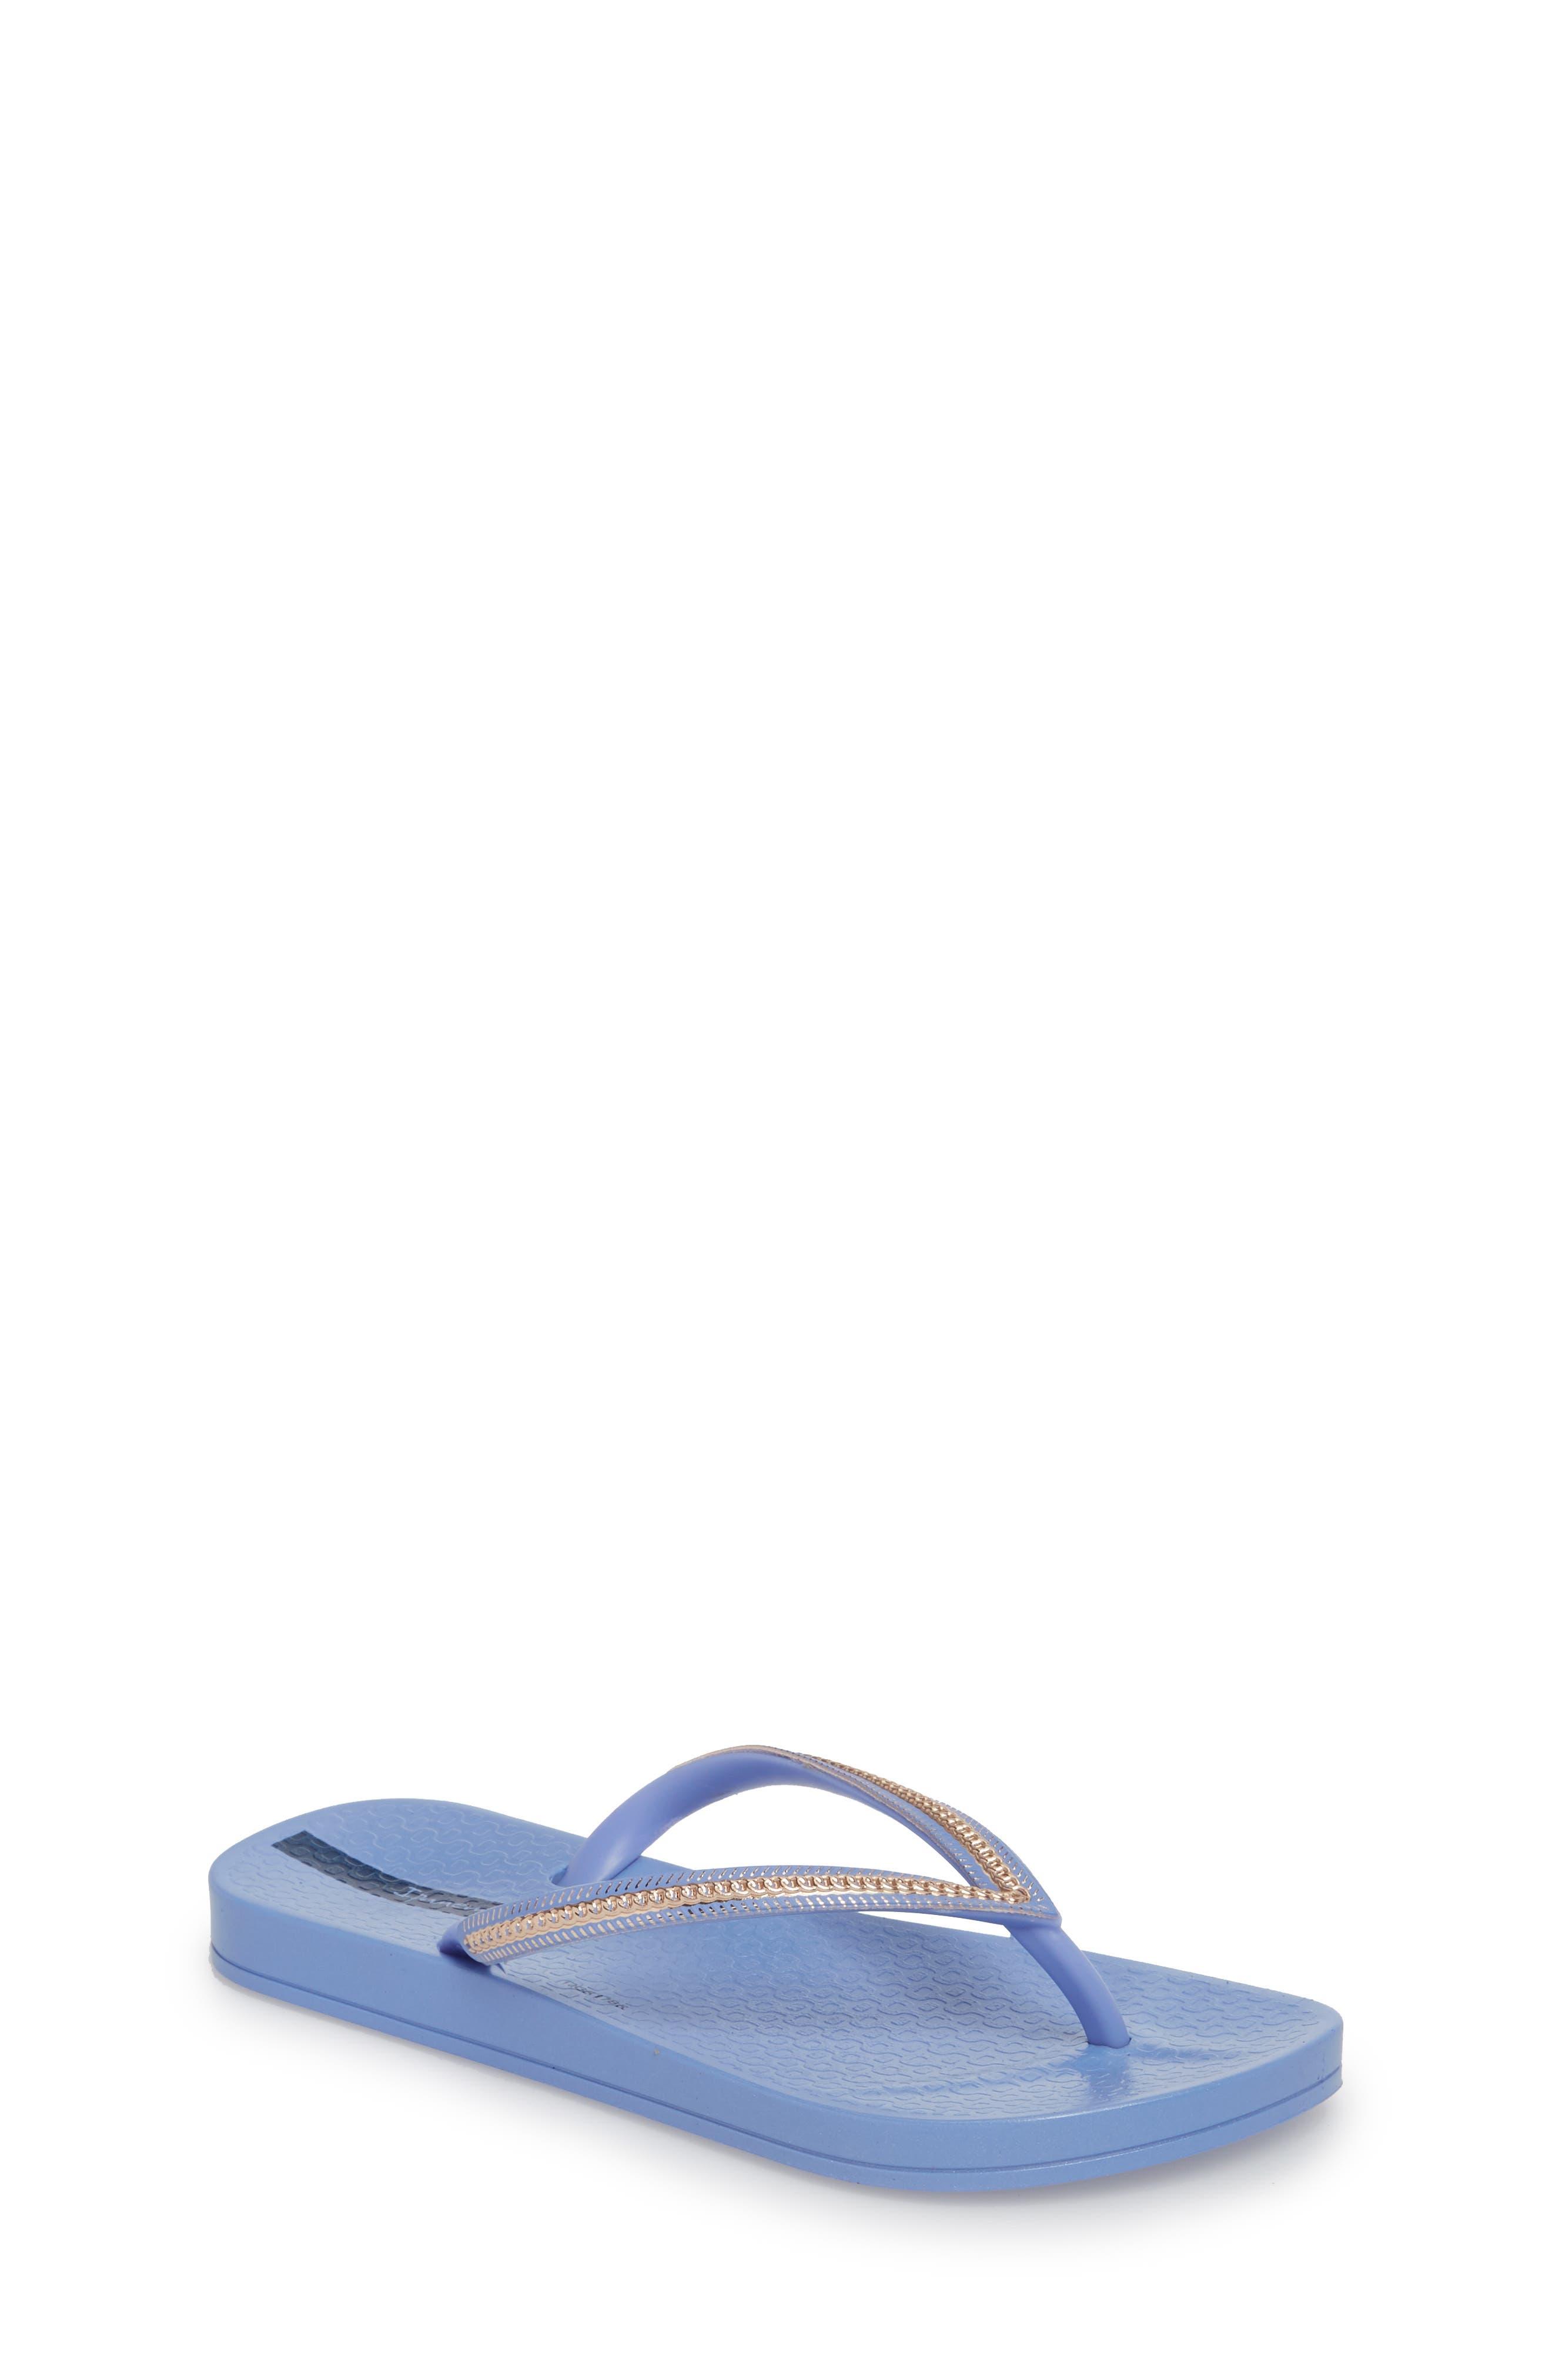 Ana Metallic Flip Flop,                         Main,                         color, Blue/ Rose